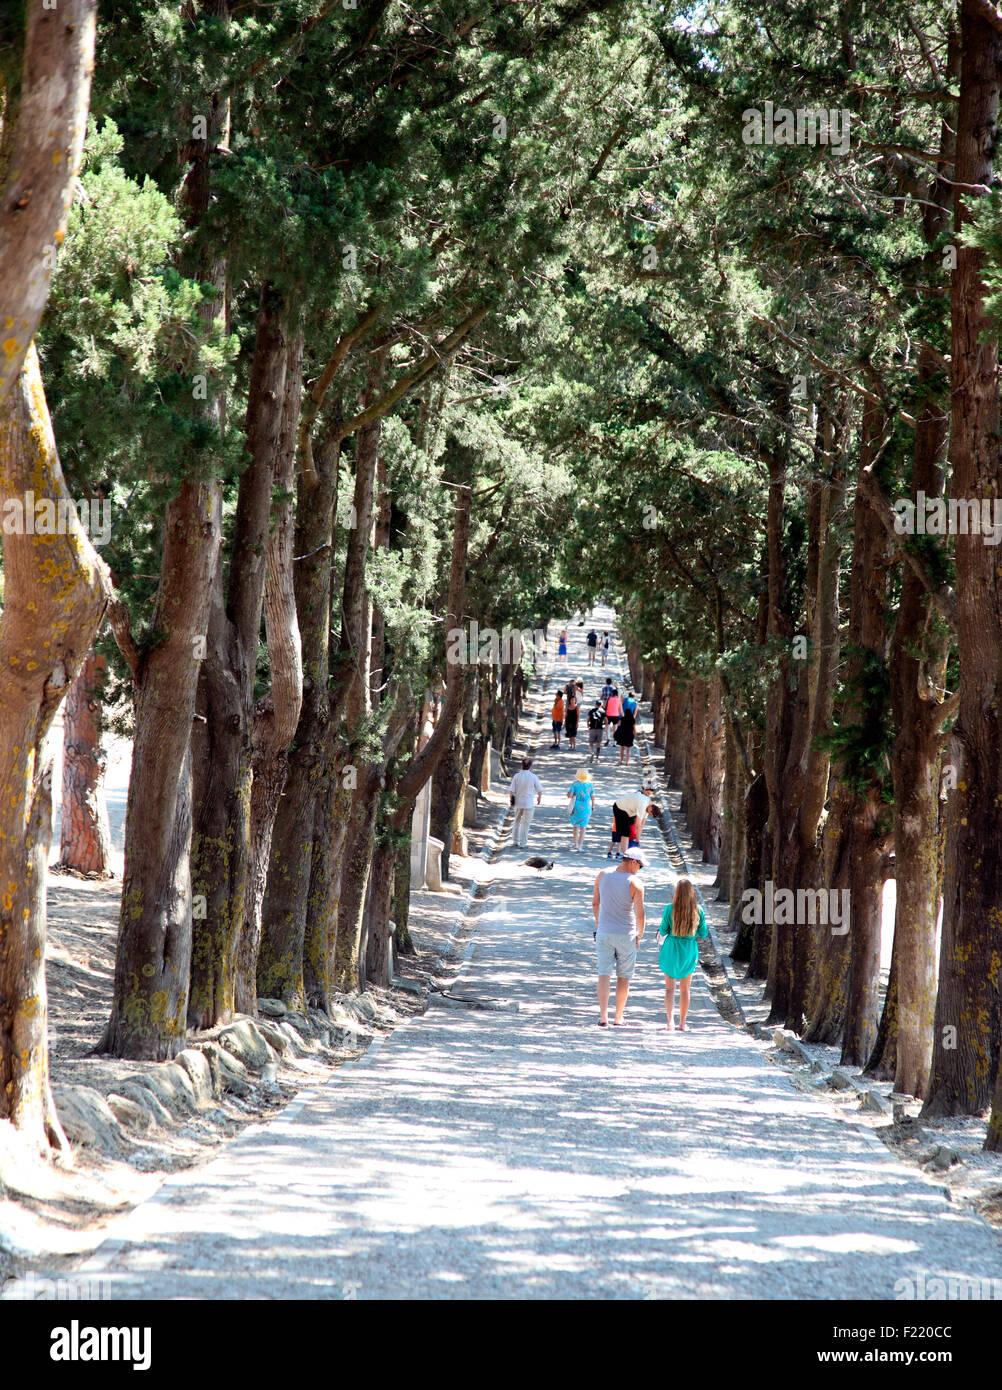 Road to Calvary, Monks Walk at Filerimos Monastery on Rhodes - Stock Image